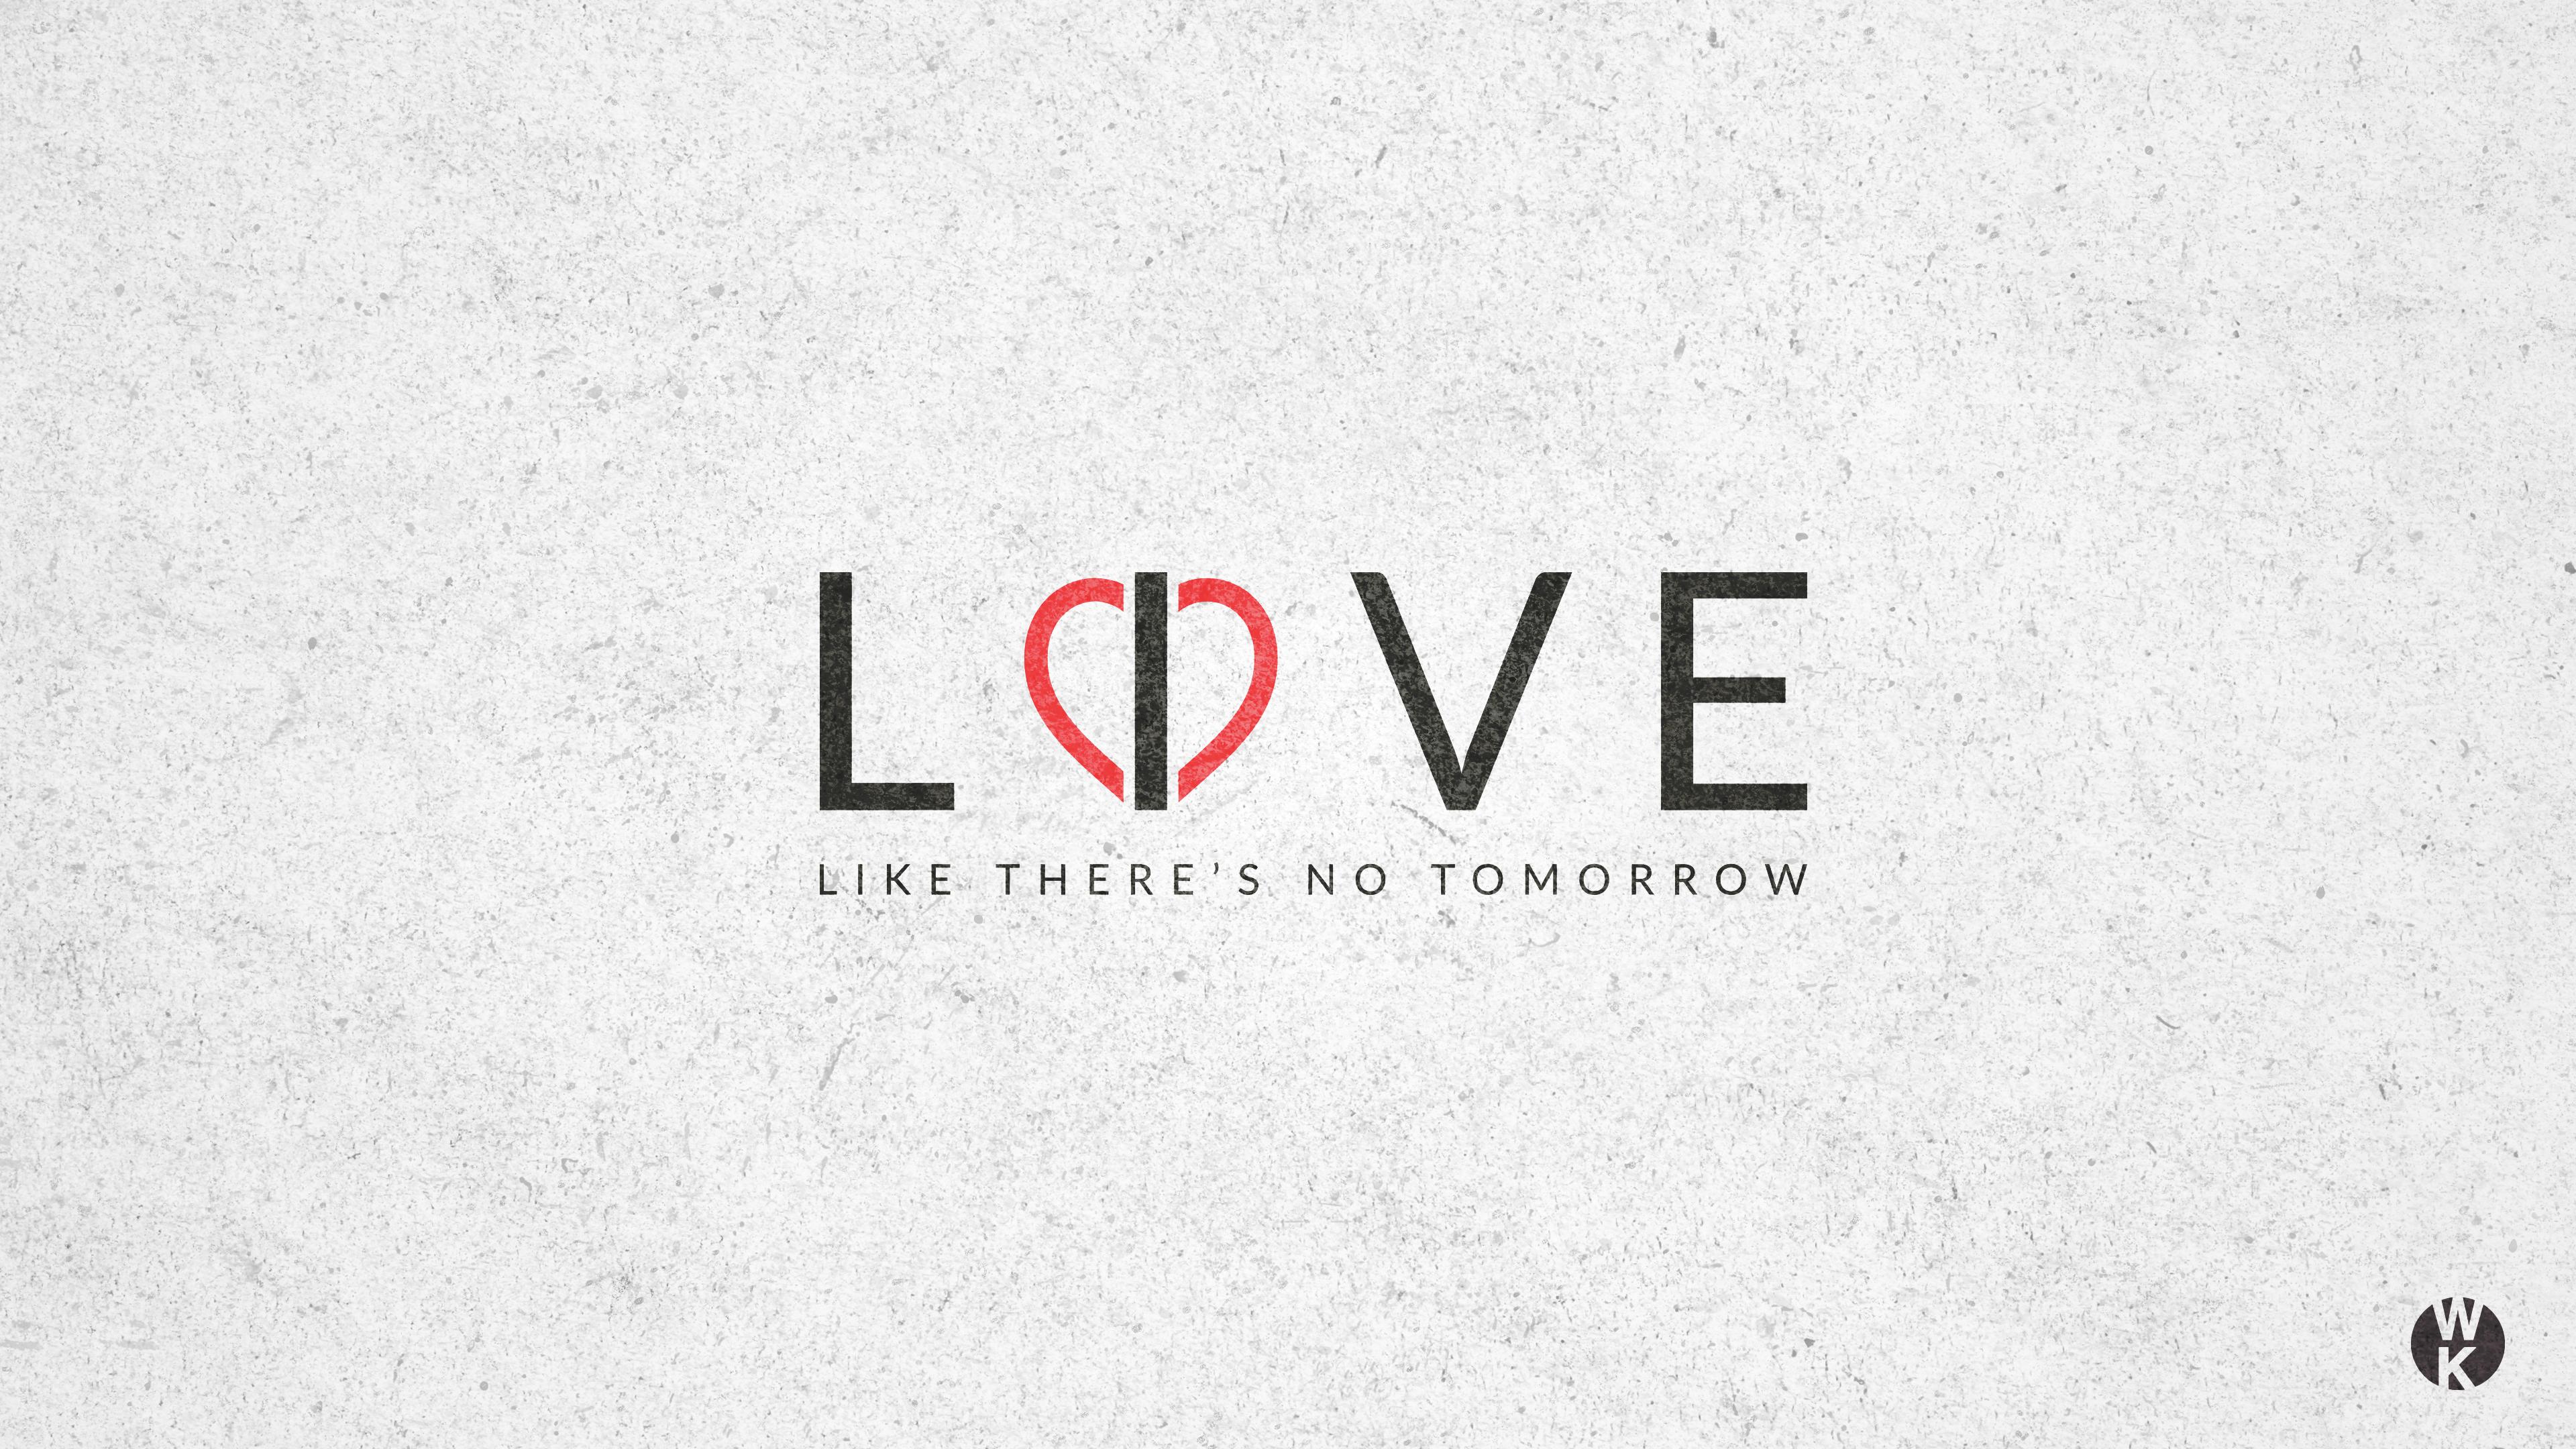 Love Artistic Statement 3840x2160